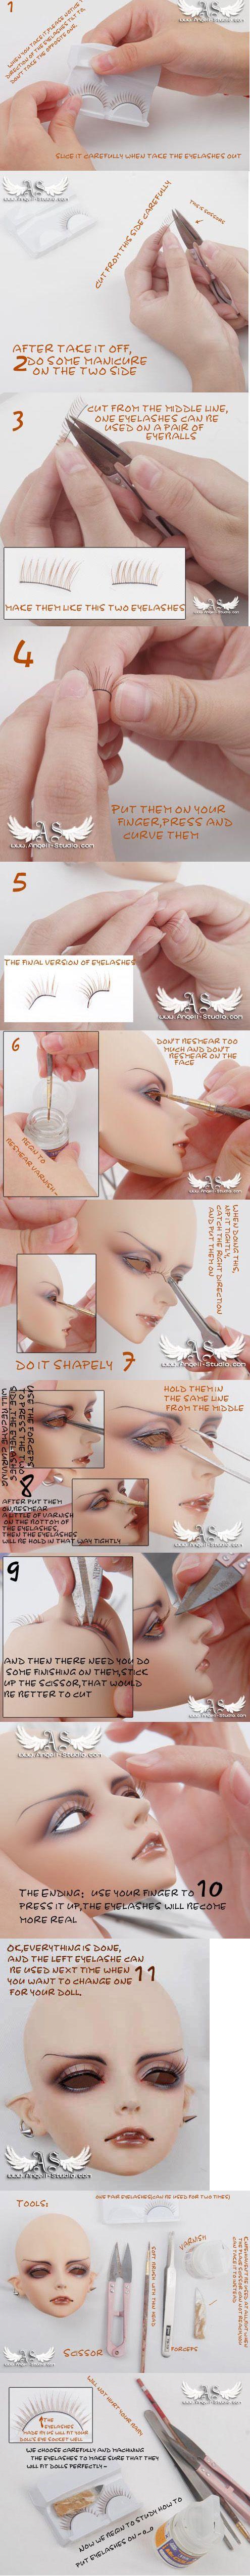 Eyelashes Attaching for dolls by ~Angell-studio on deviantART